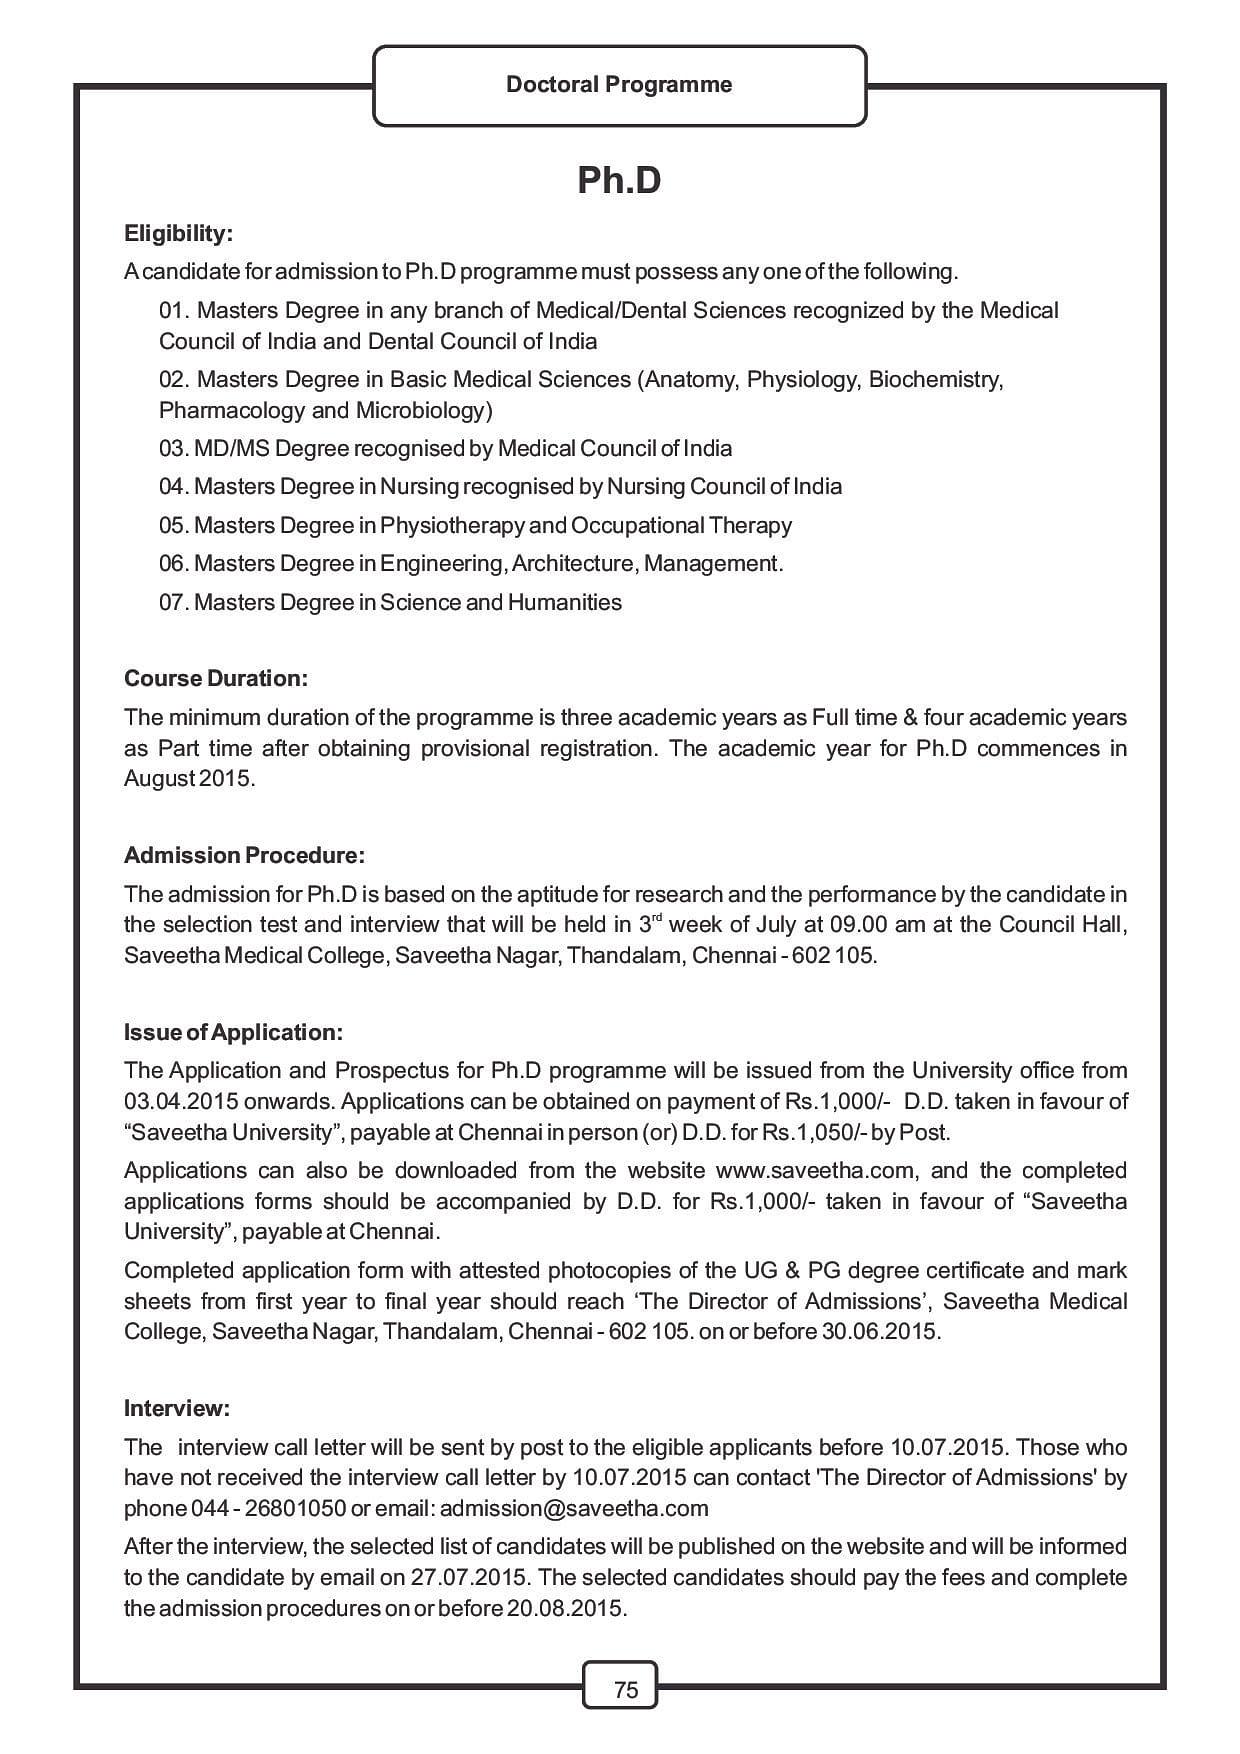 Saveetha university chennai admissions contact website saveetha university chennai college information brochure phd in medicine image 1 aiddatafo Gallery